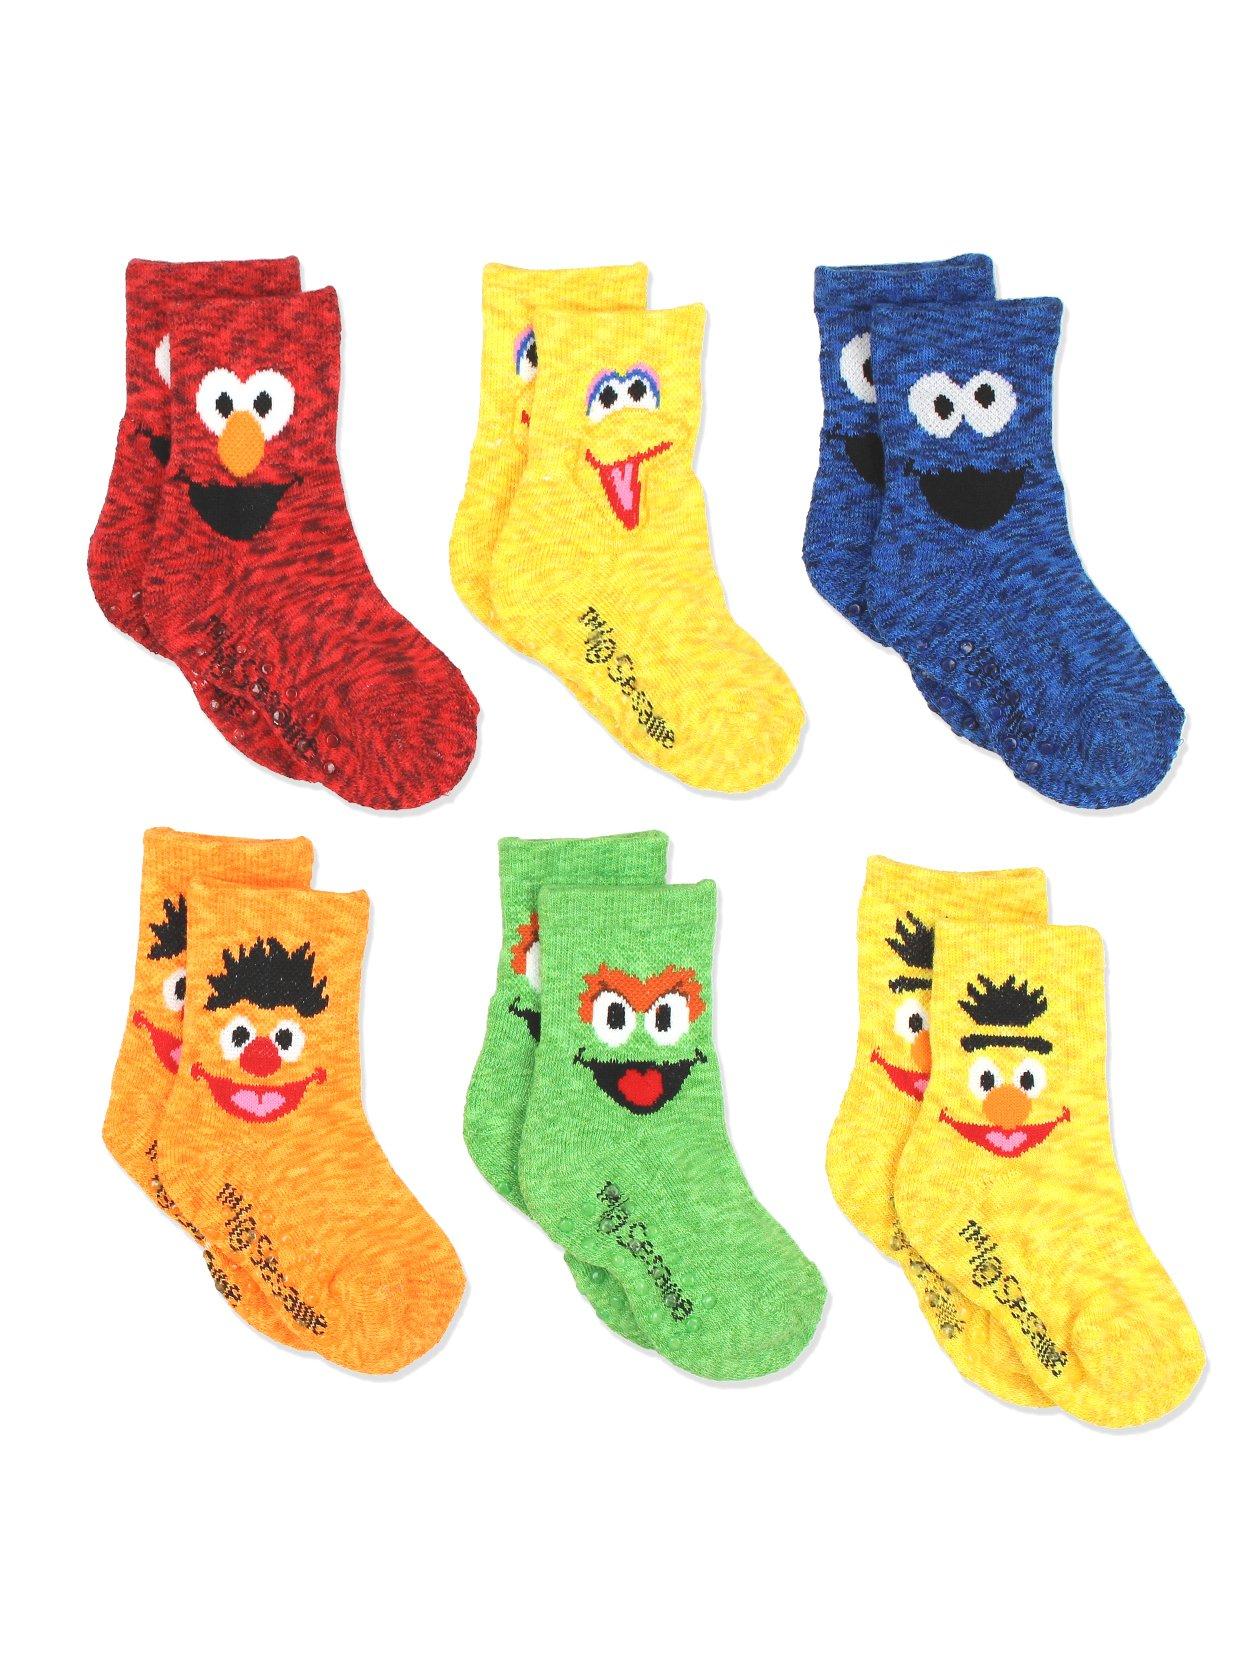 Sesame Street Elmo 男童女童多件装带抓手袜(婴儿/幼儿)